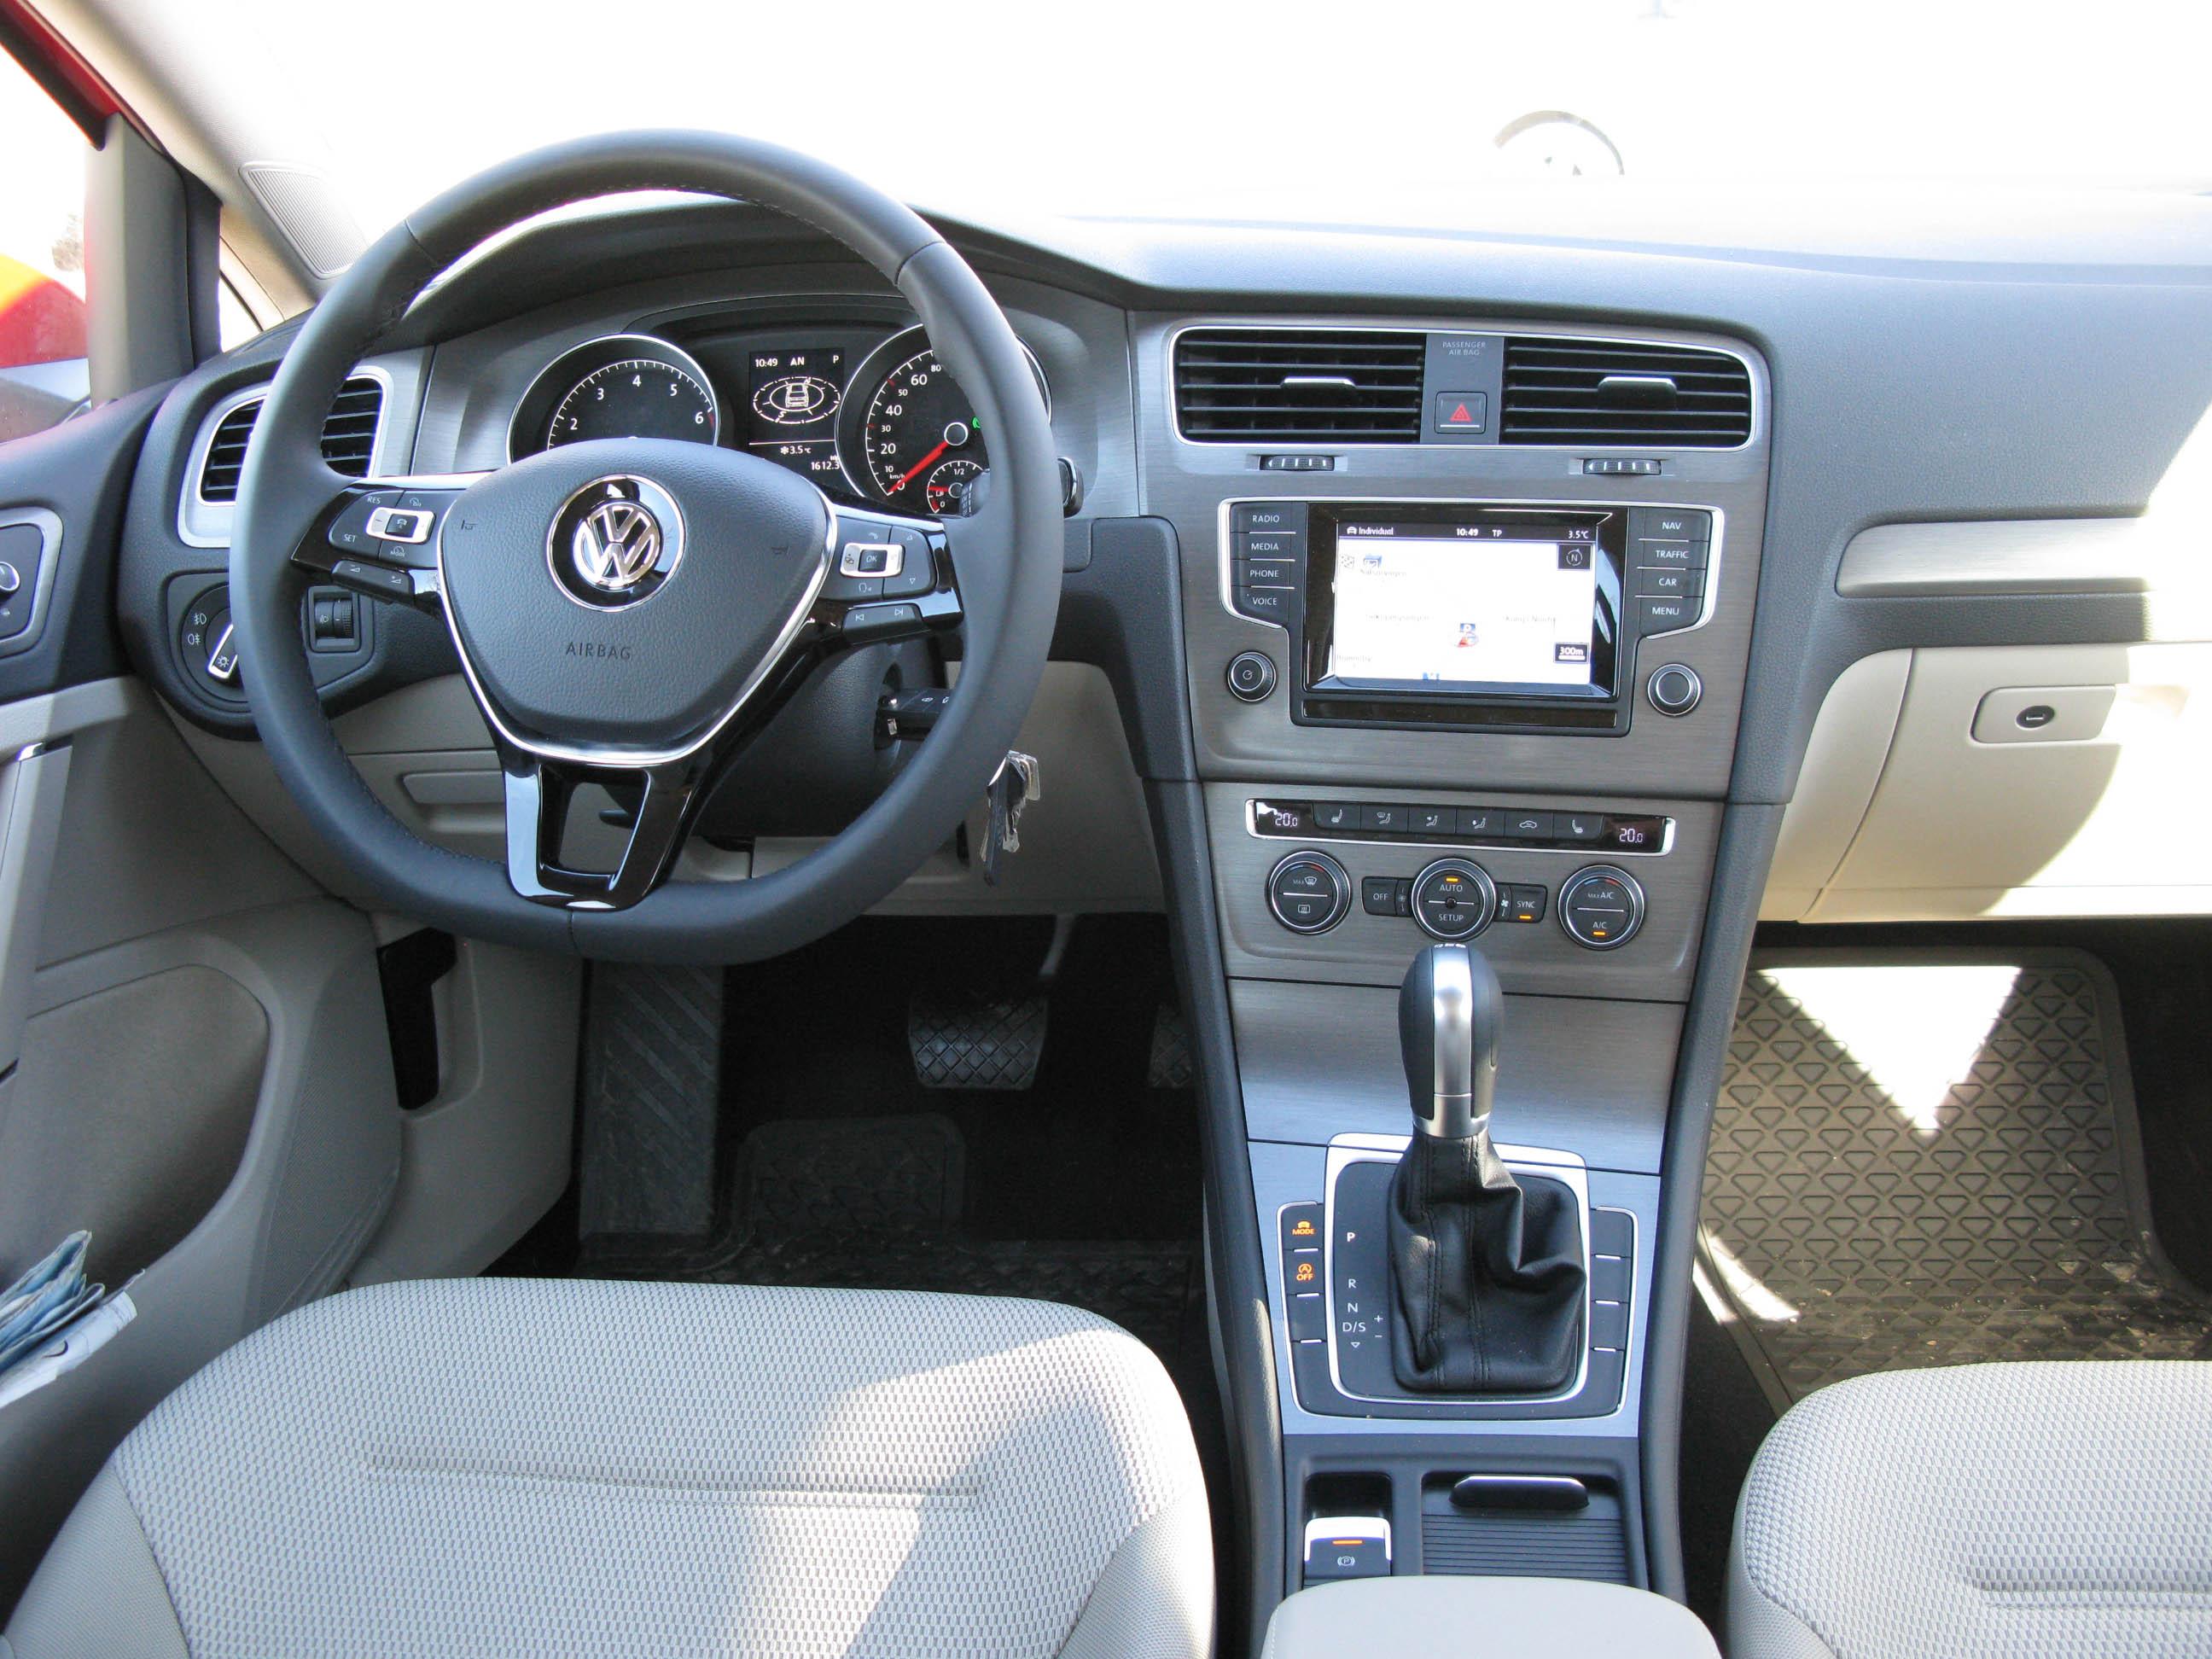 Plik:VW Golf 7 dash.jpg